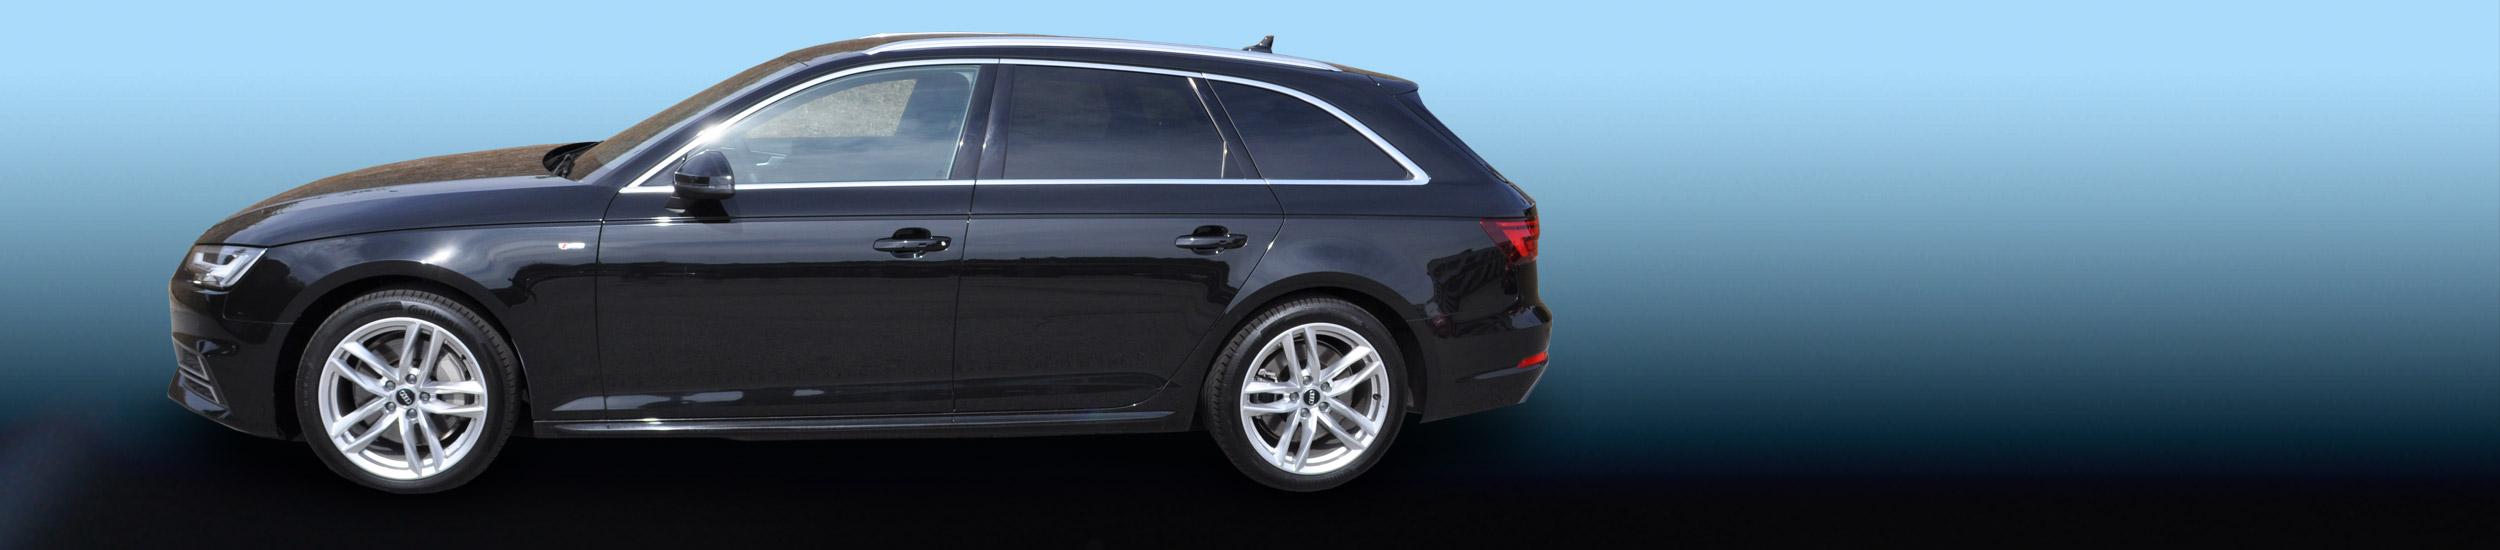 NEU - Audi A4 Avant 3TDI Quattro Mietwagen